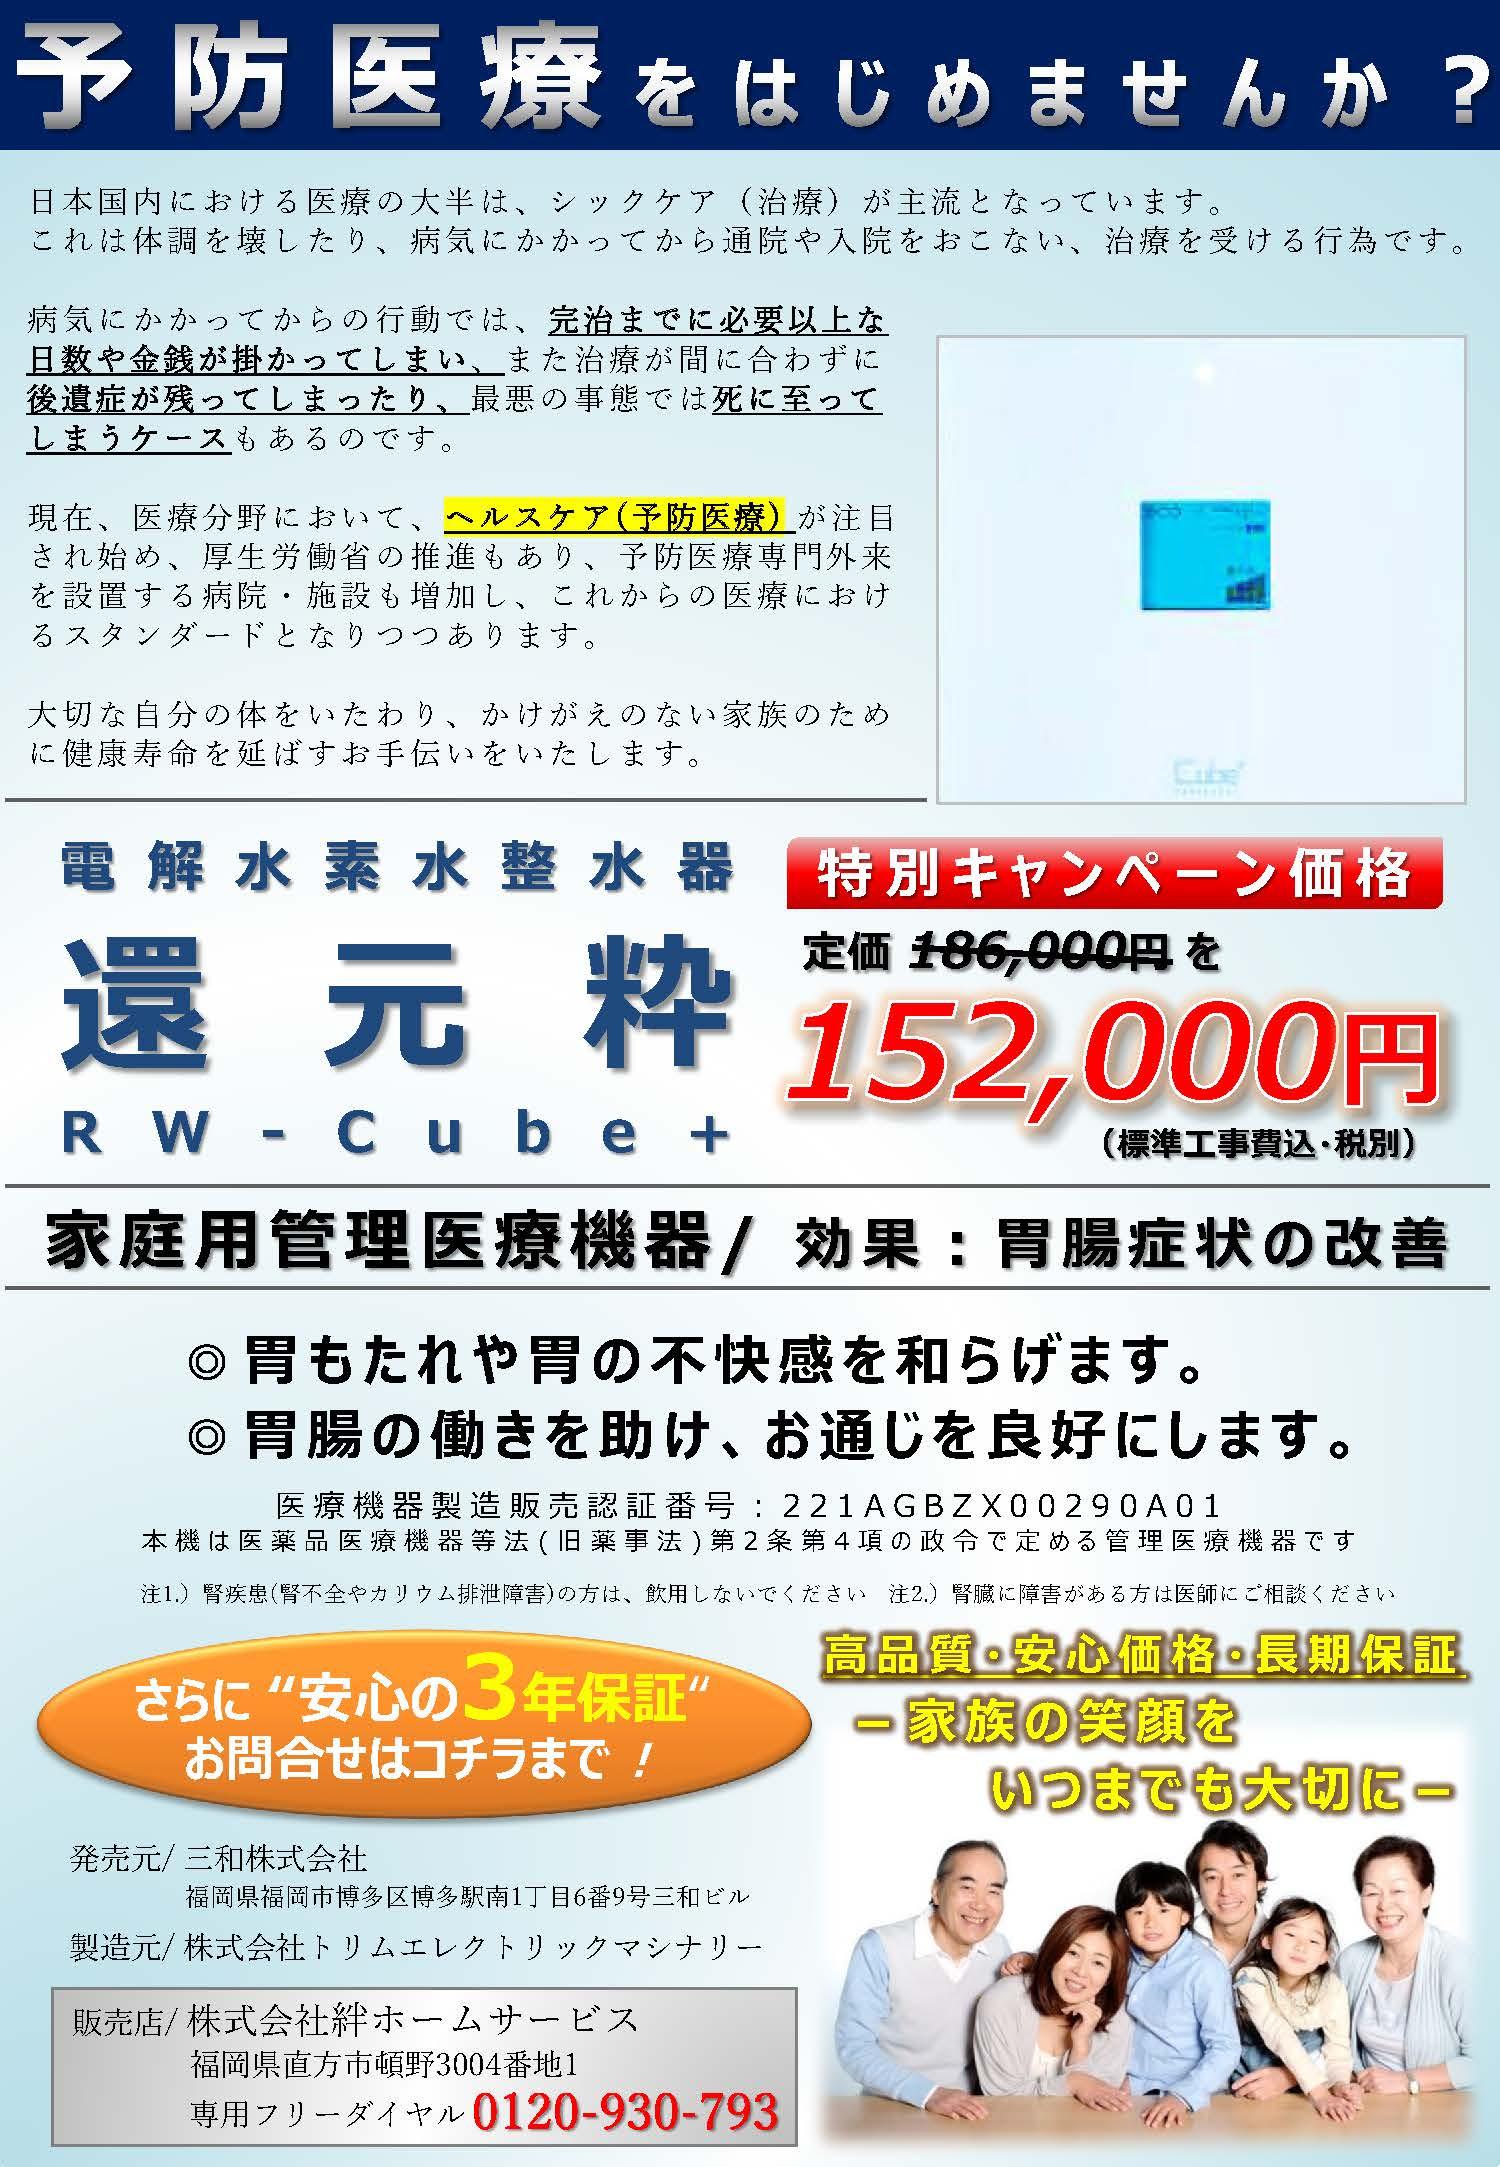 RW-Cube+